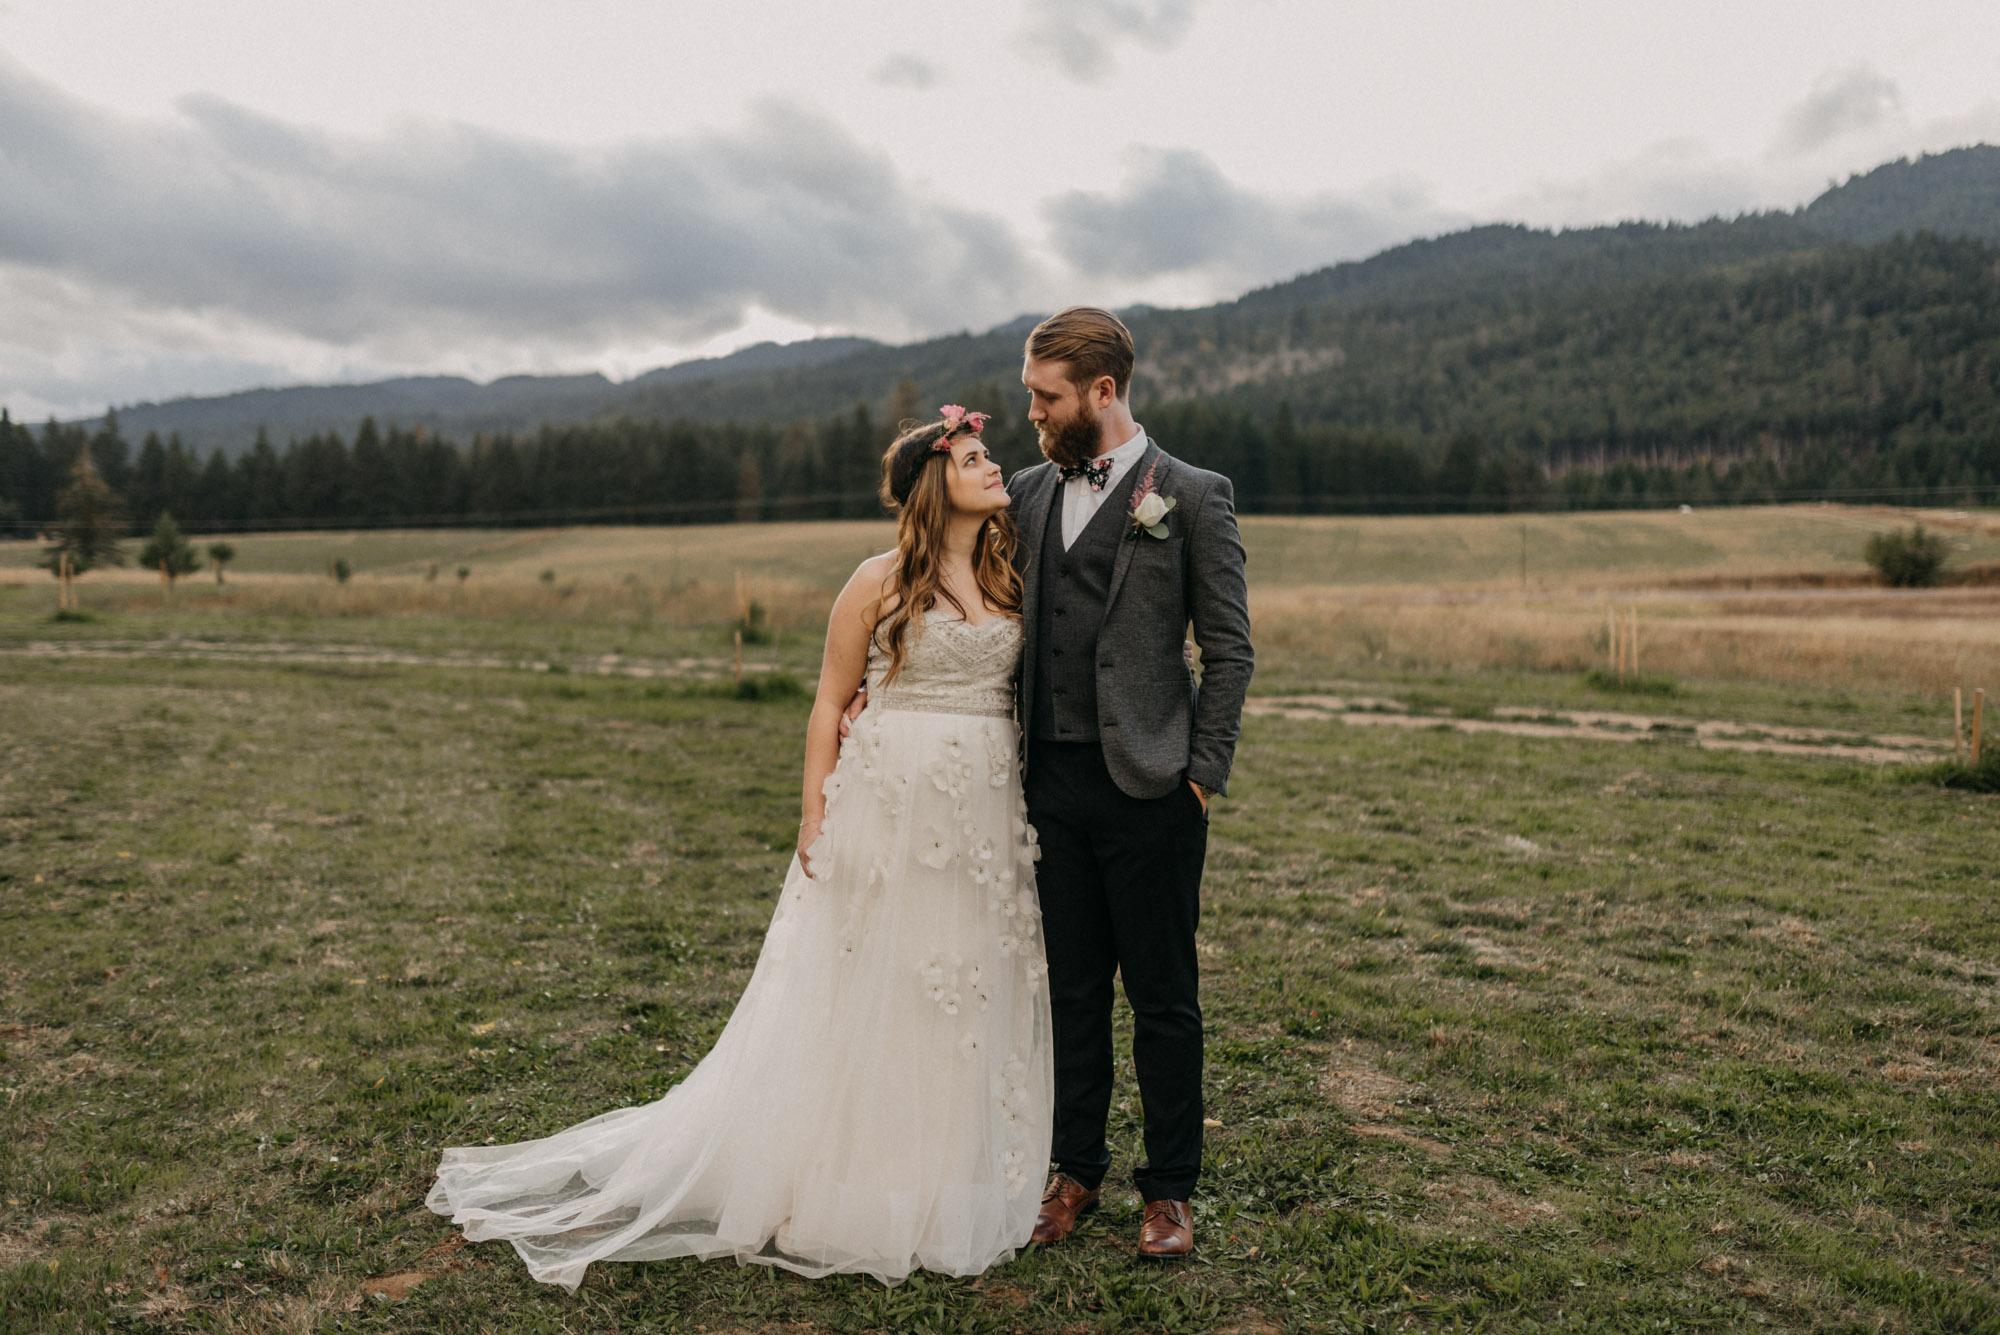 Portland-Washington-Wedding-Photographer-Outdoor-9220.jpg